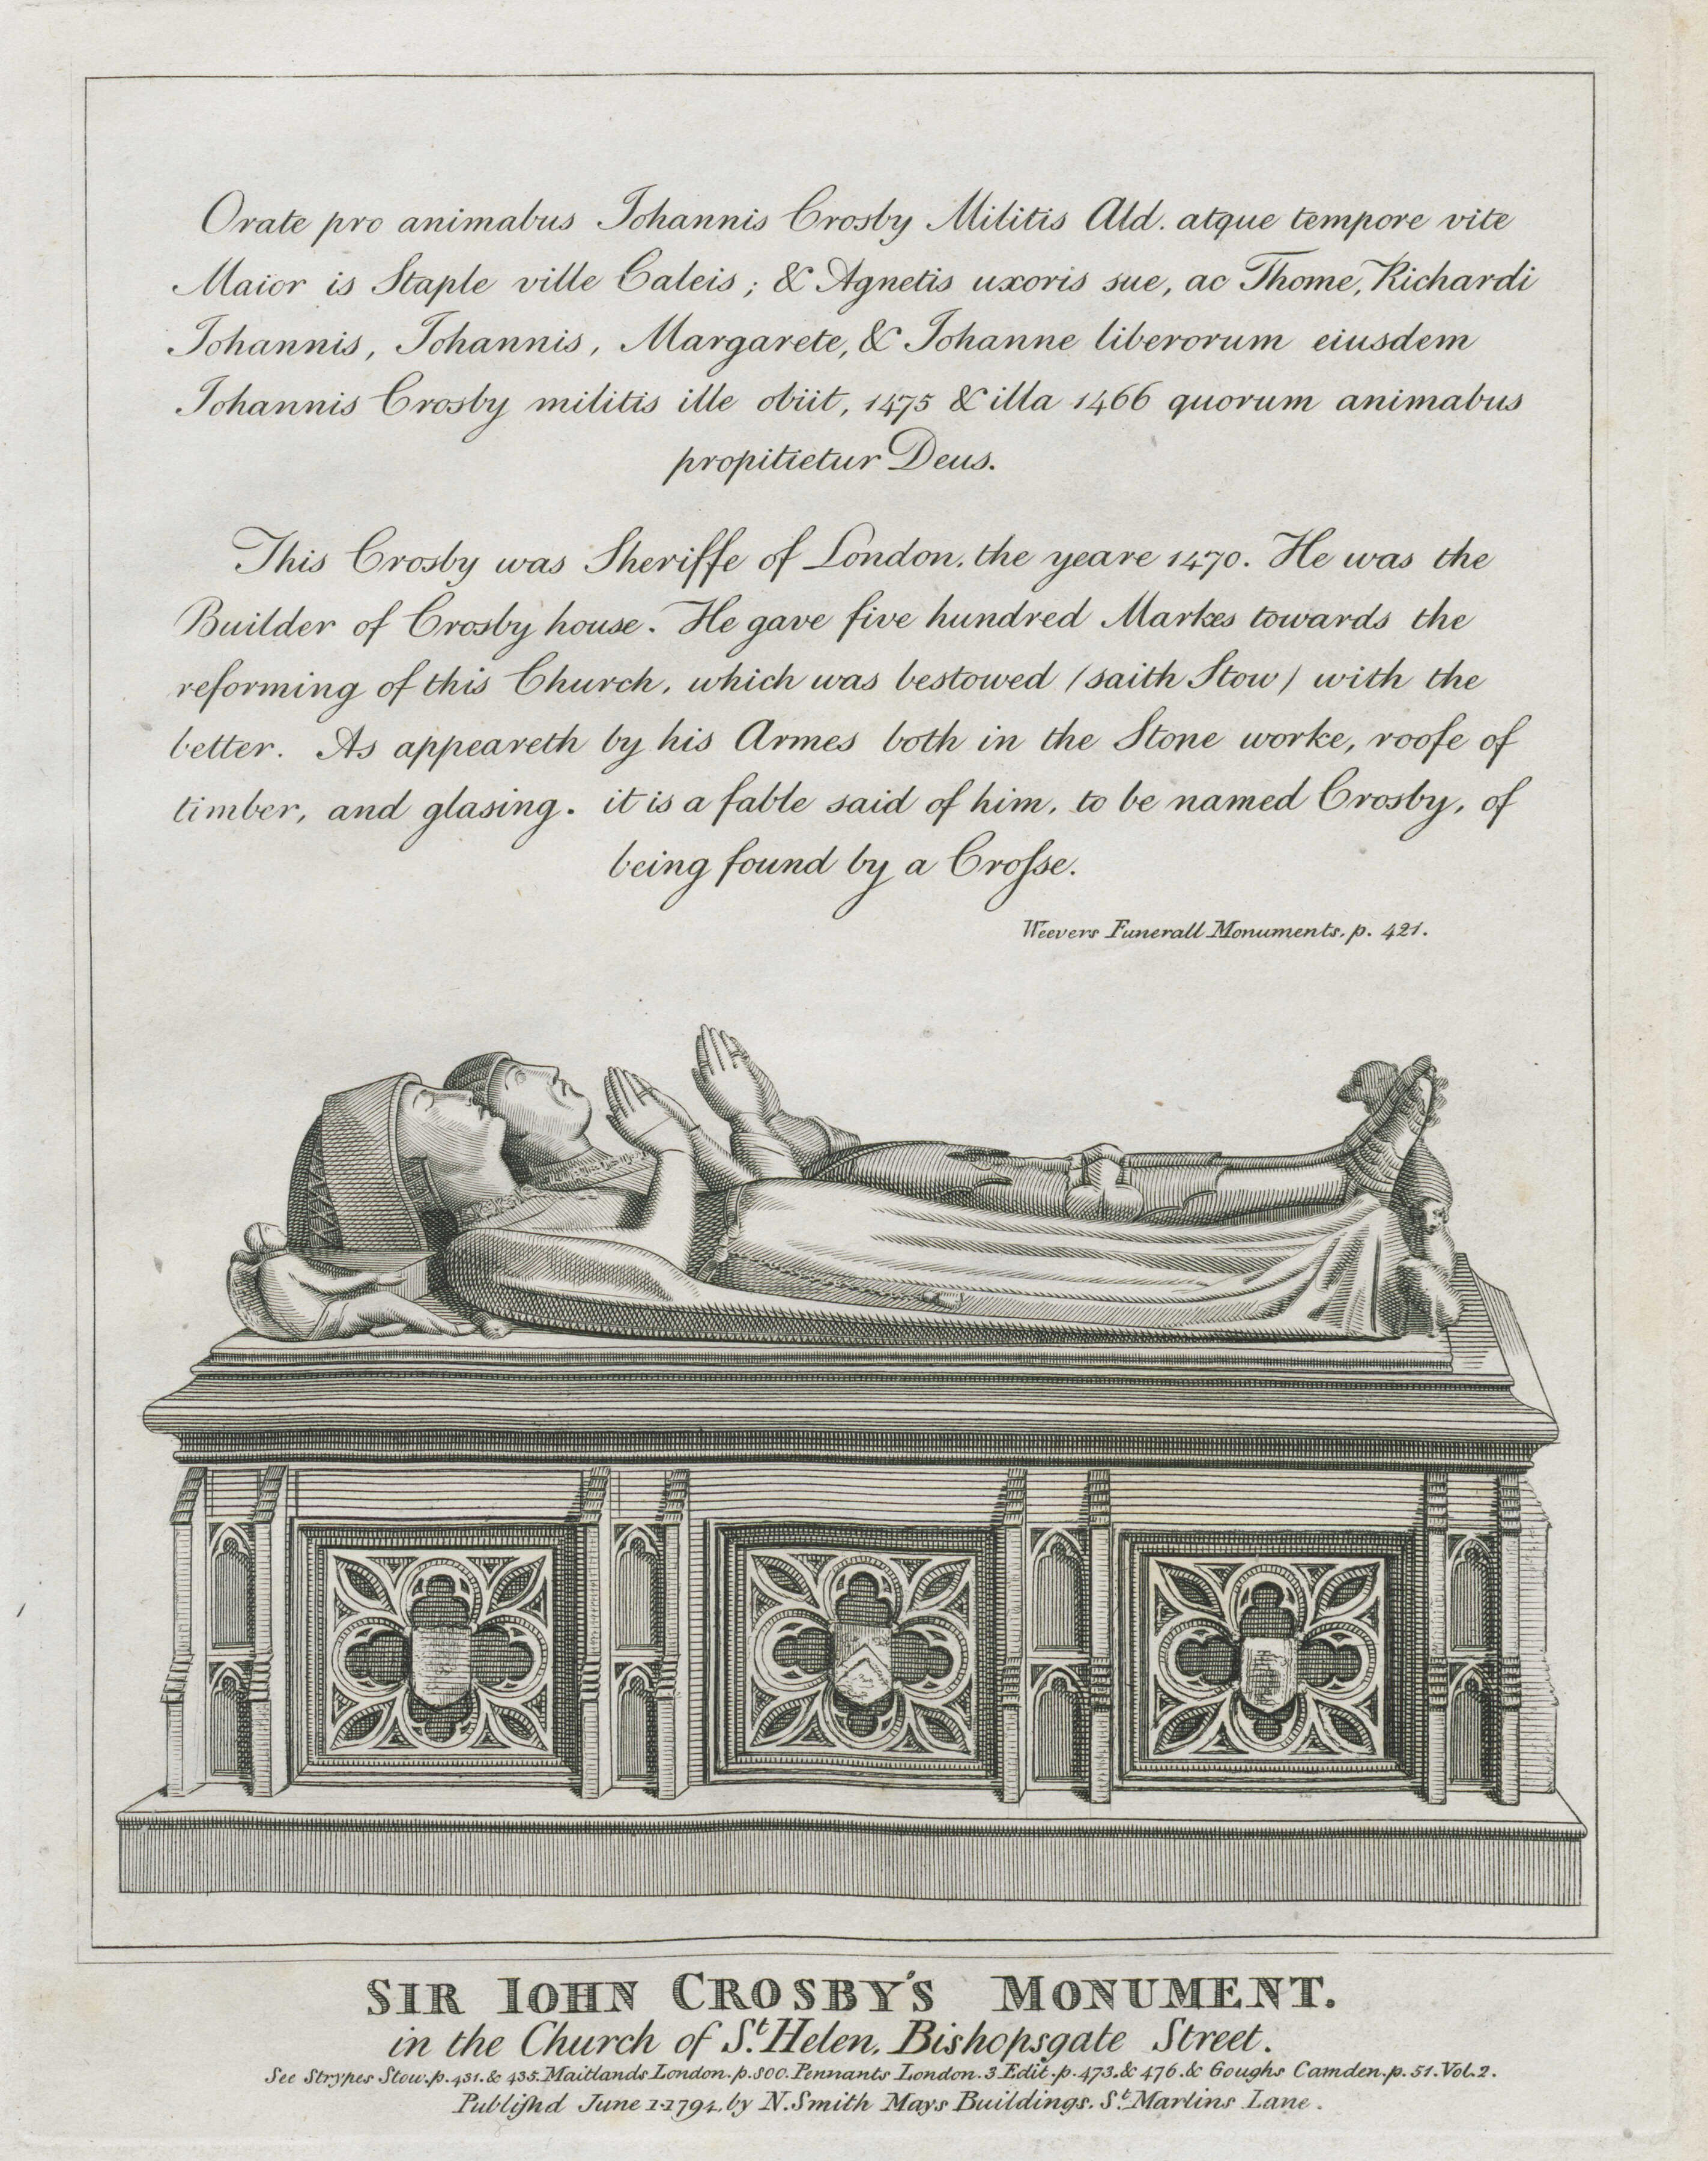 54-sir-iohn-crosbys-monument-in-the-church-of-st-helen-bishopsgate-street